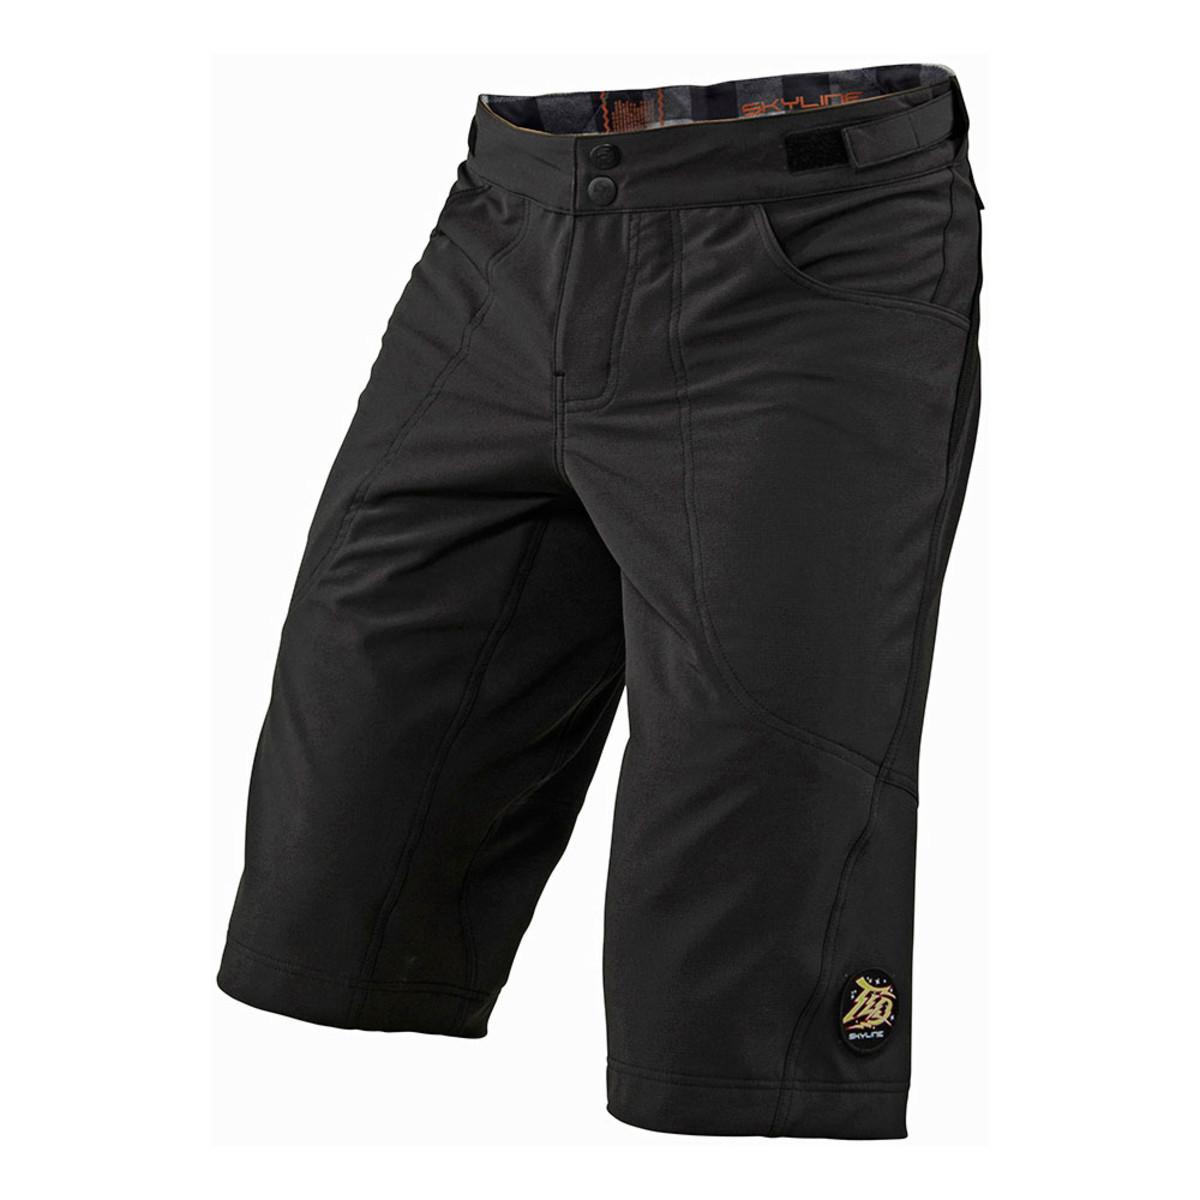 mountain bike shorts skyline-short_black-1 klkkayr